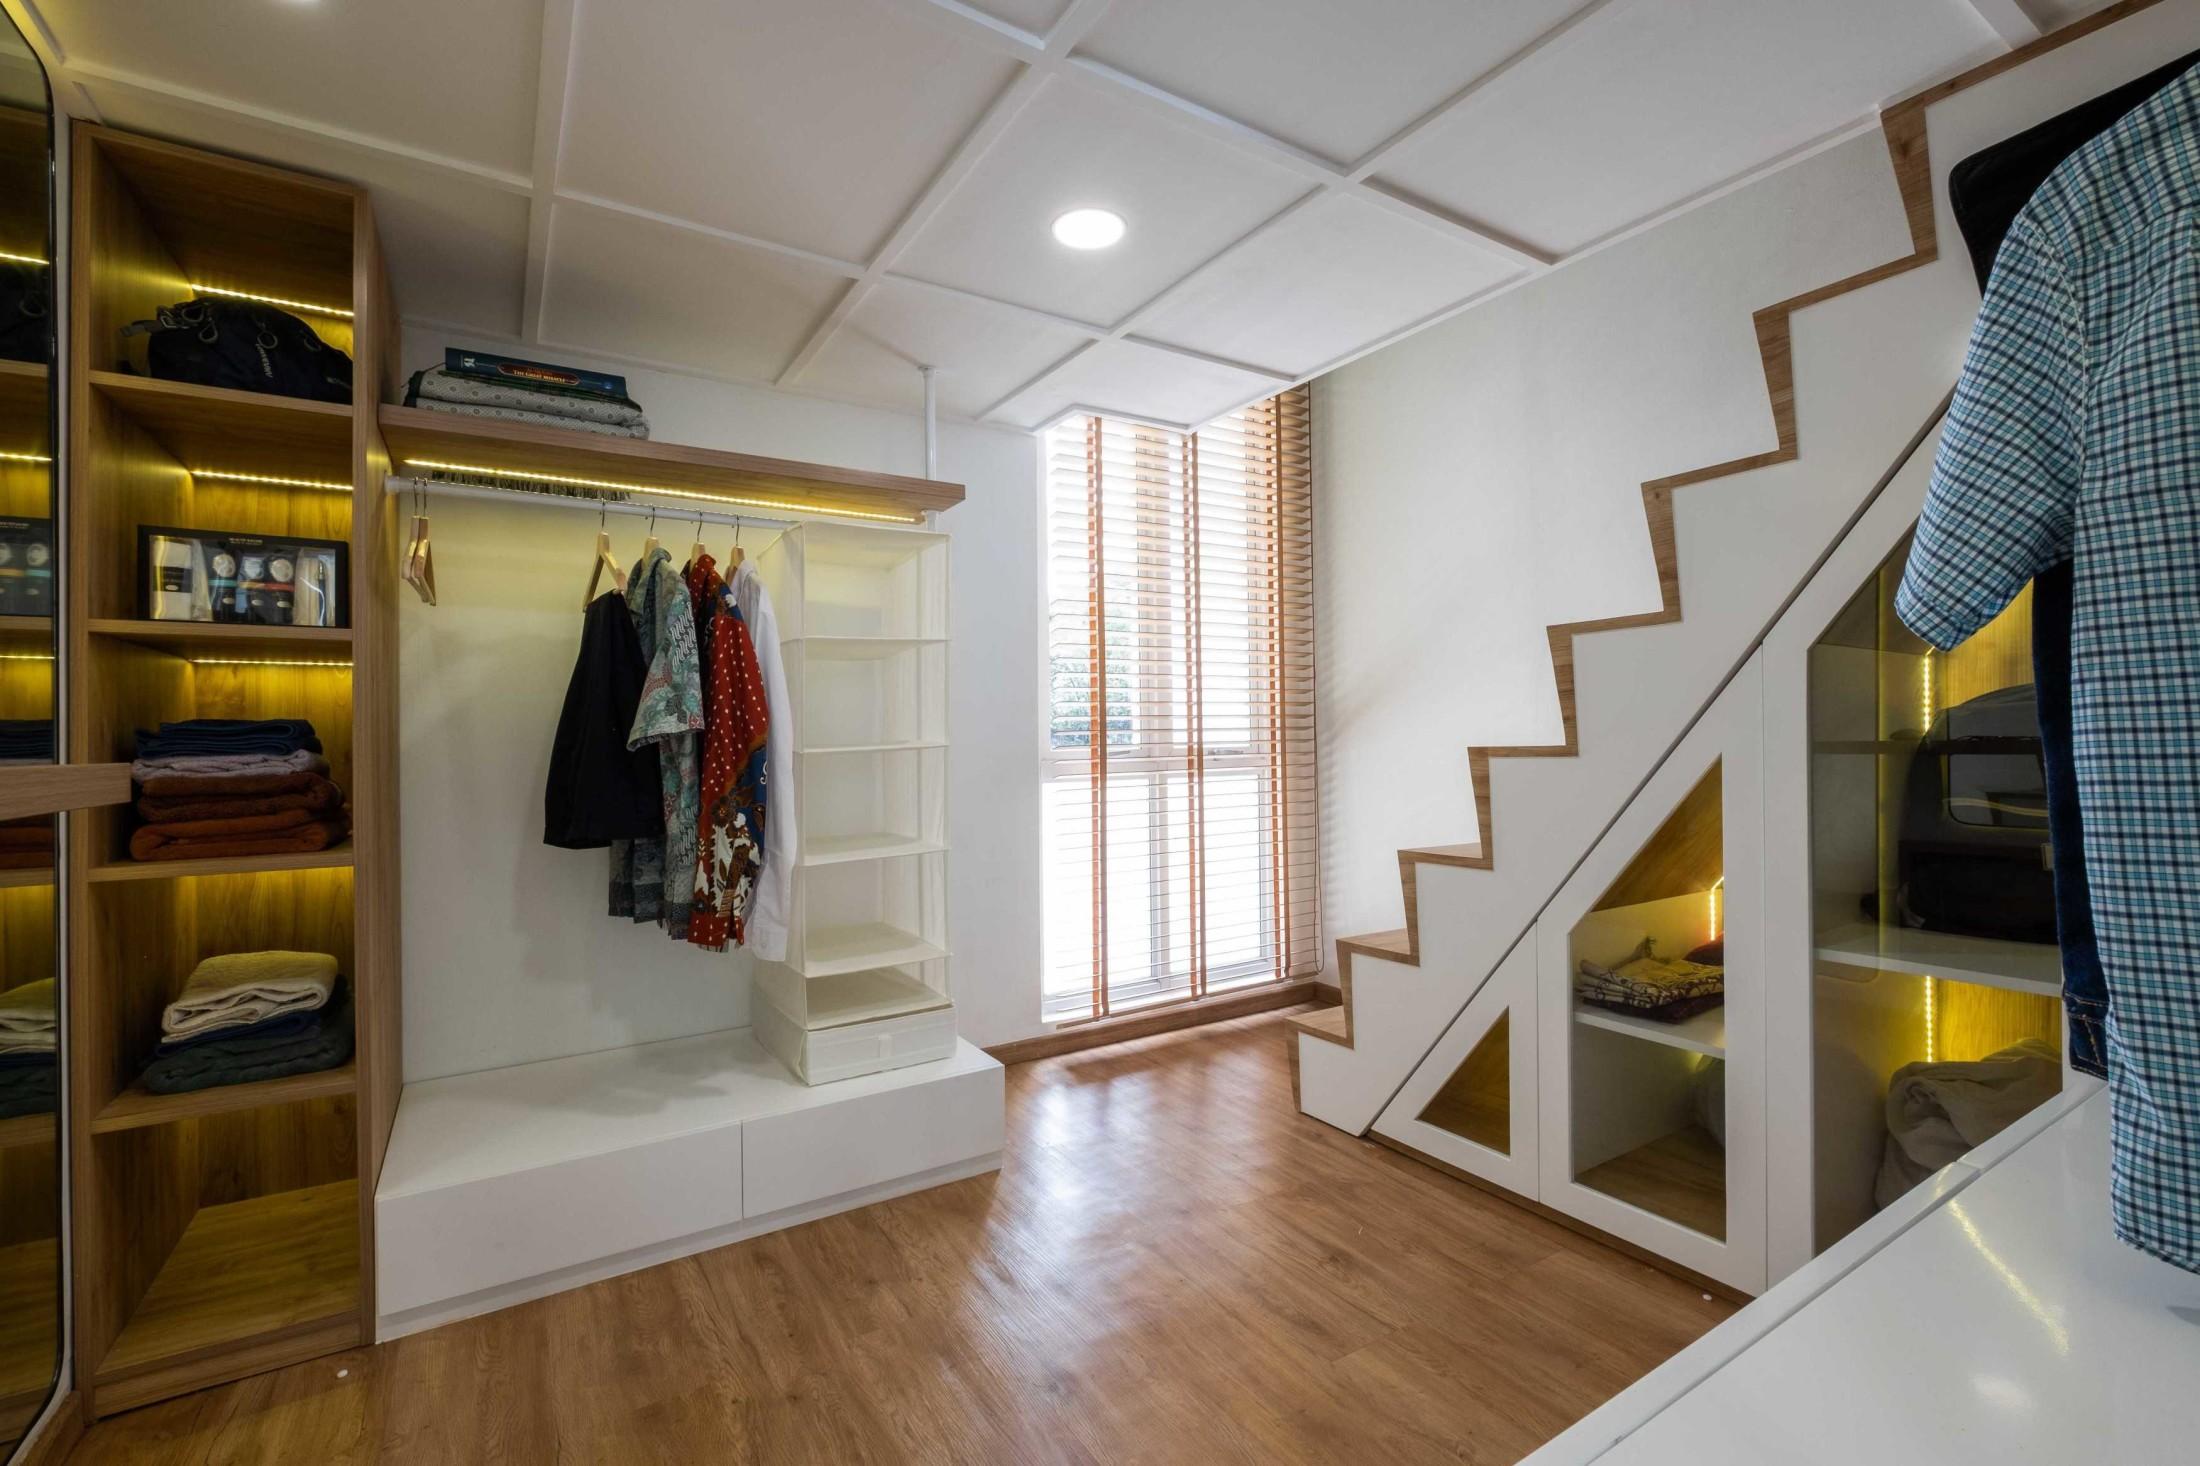 Area walk-in closet yang berdampingan dengan tangga menunjukkan keunikan konsep desain interior rumah mungil ini dibanding rumah lainnya. Paduan warna putih glossy dengan warna alami dari kayu parket pada lantai, anak tangga, dan tirai menampilkan suasana yang hangat, natural, bersahaja, dengan tampilan yang bersih dan terang.